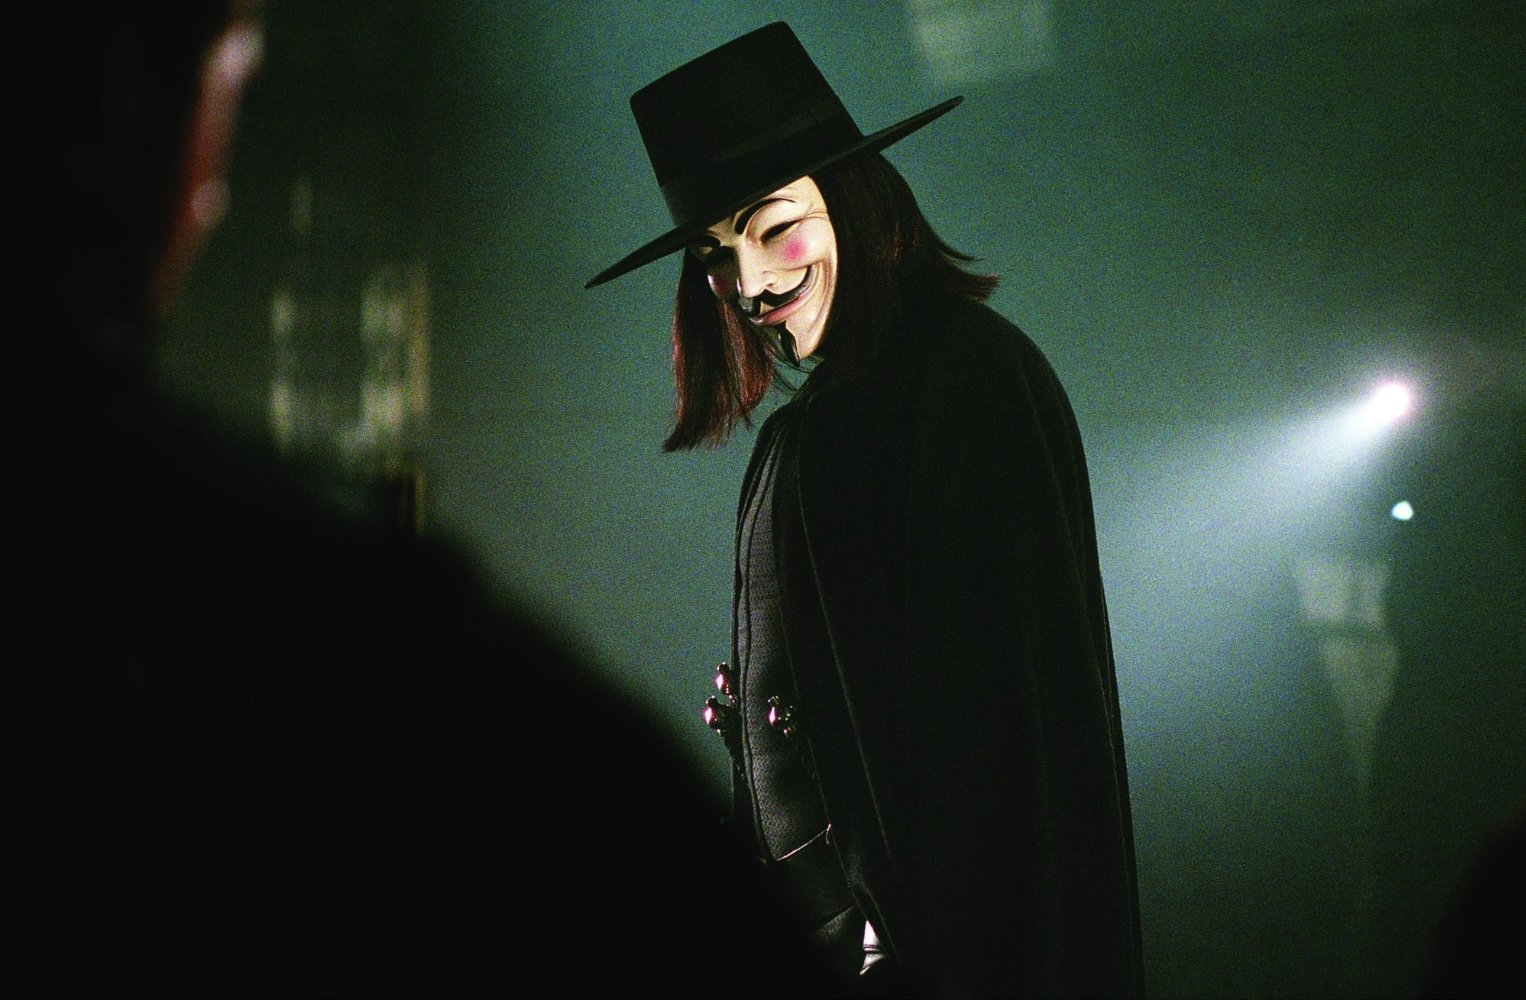 Descargar V de venganza V de Vendetta 2016 hd Castellano English Latino